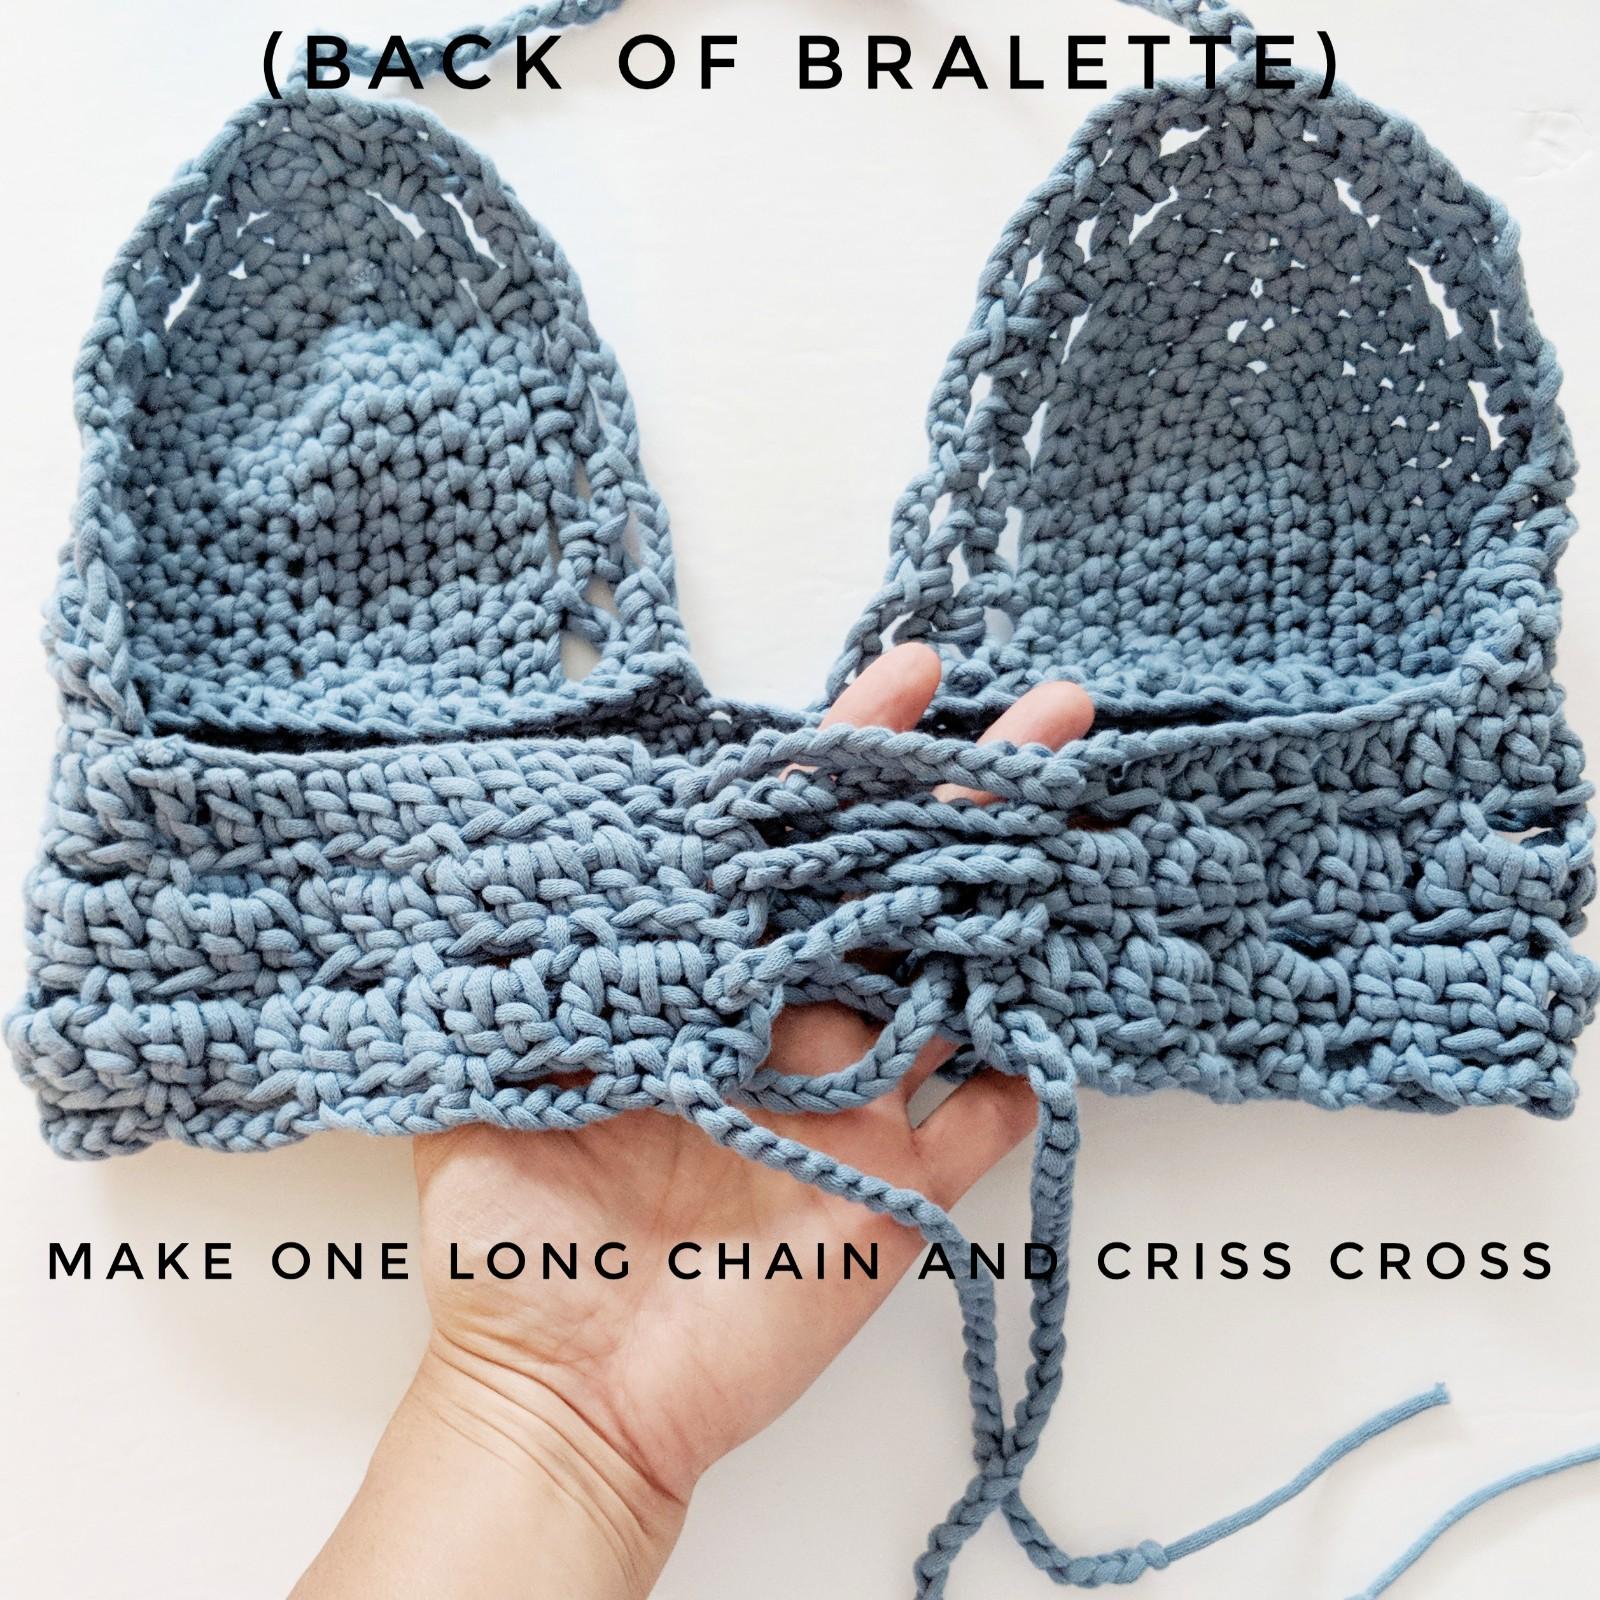 Sarah Bralette Pattern Oth Crochet Nook